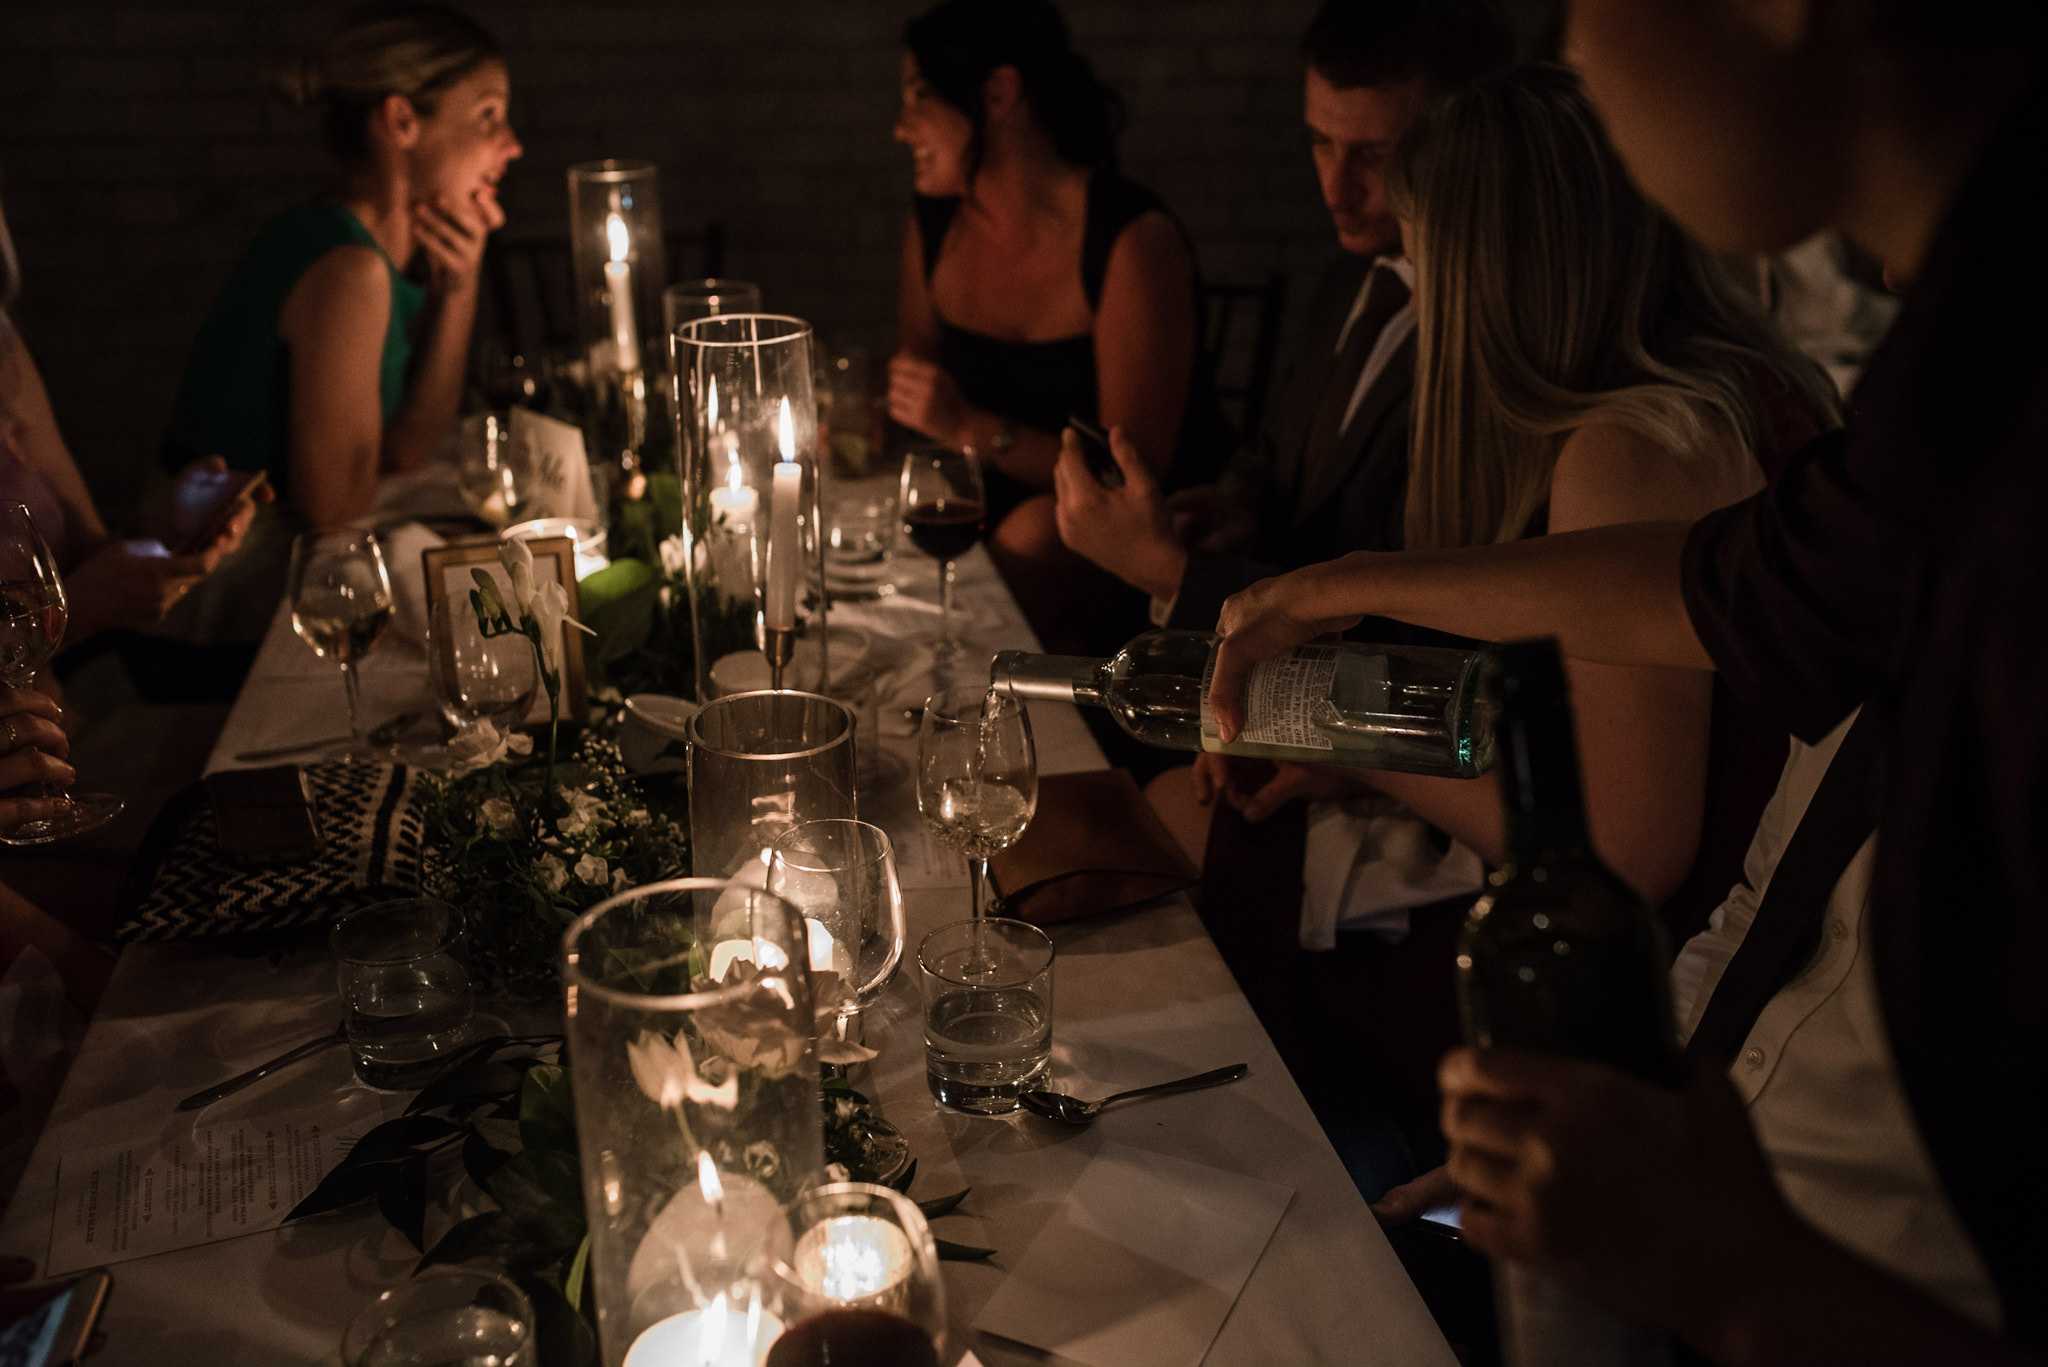 057-candlelit-reception-wedding-storys-building-romantic-toronto.jpg